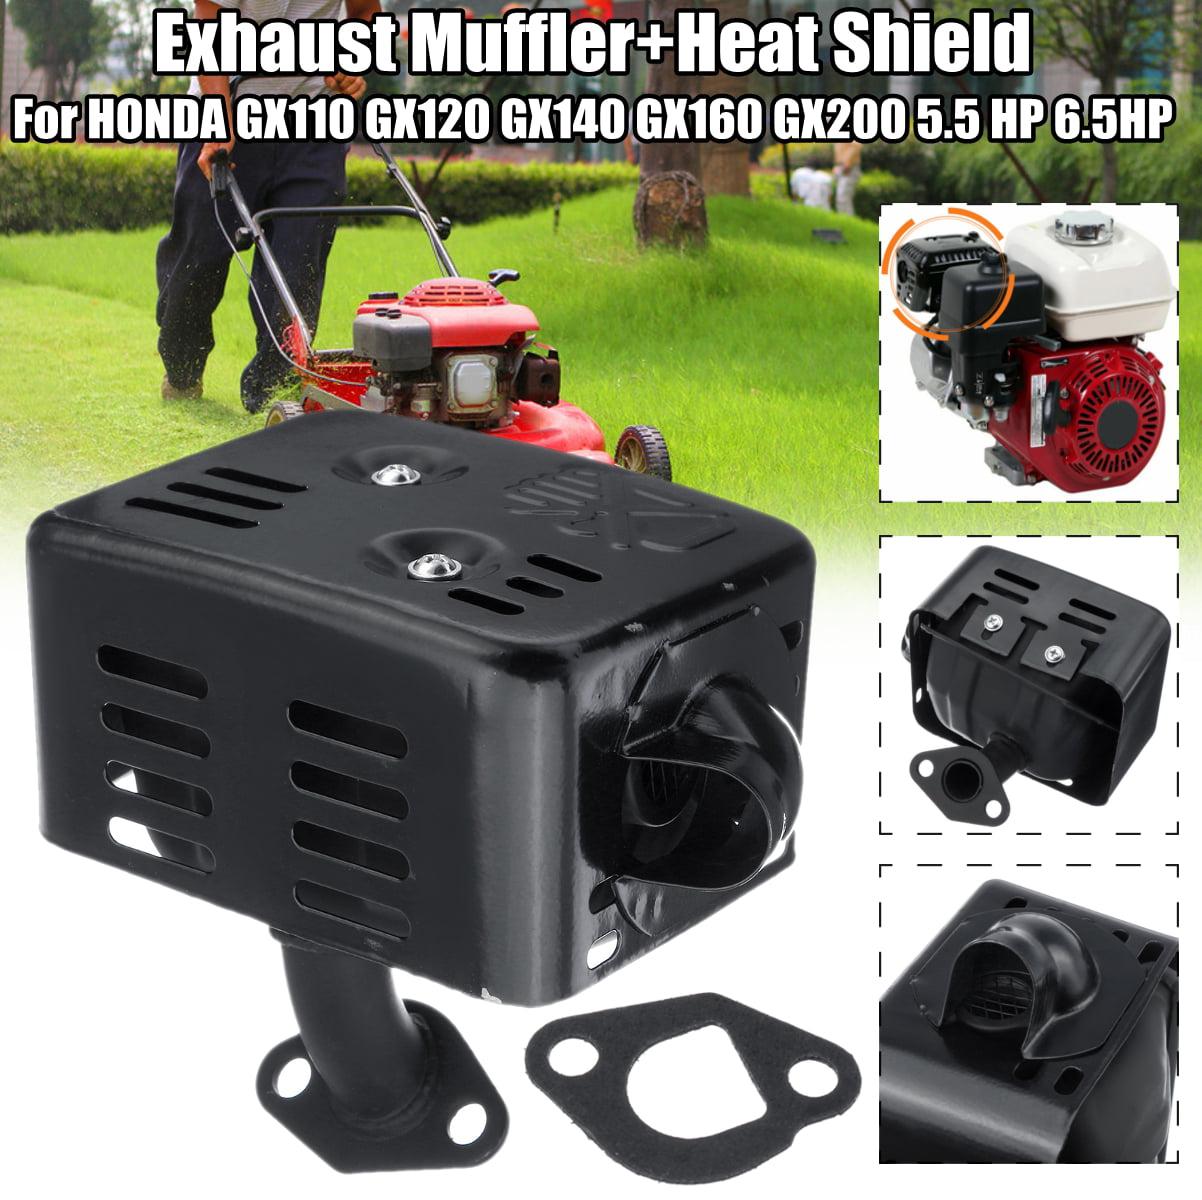 POWER PRODUCTS Muffler Exhaust Gasket Fits Honda GX110 GX120 GX160 GX200 5.5HP 6.5HP Engines